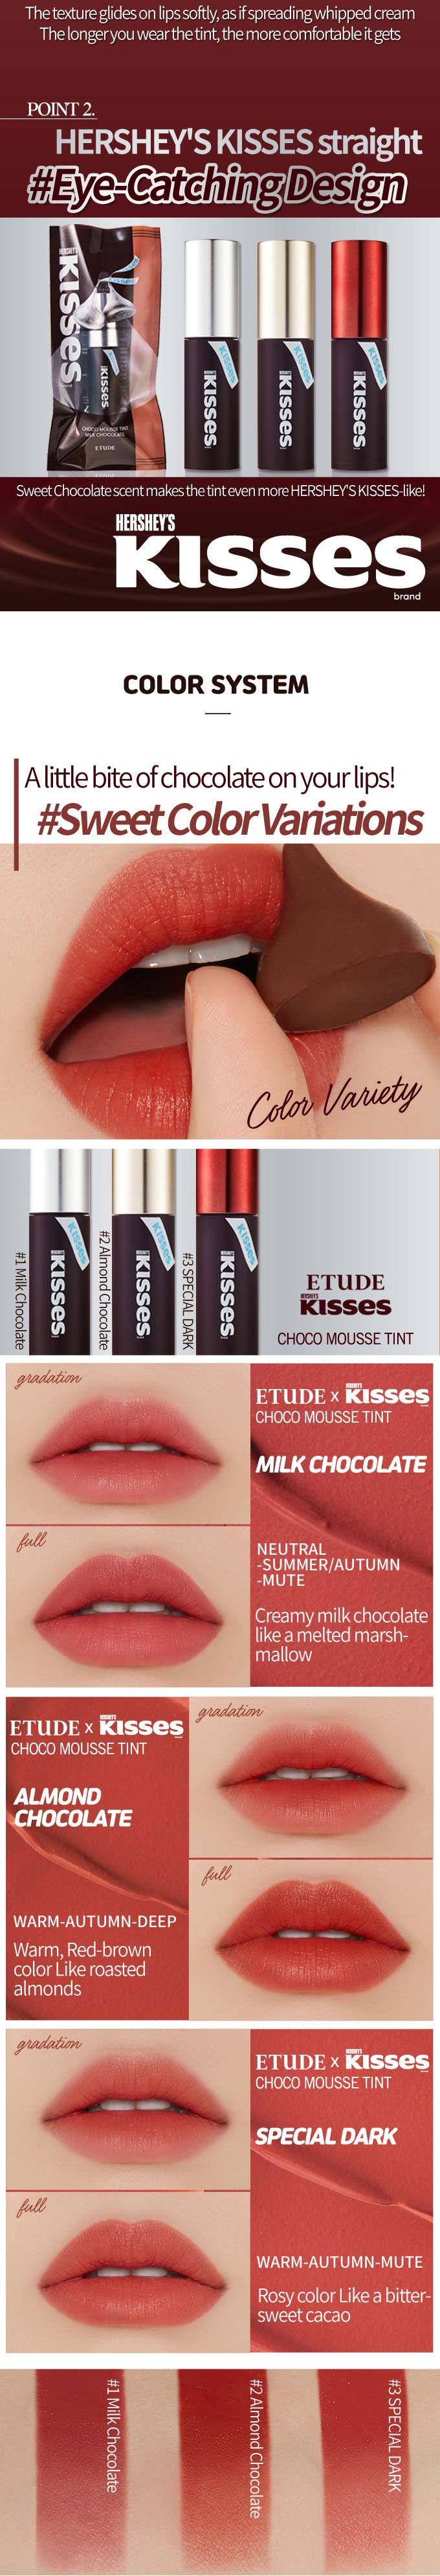 kisses-choco-mousse-tint-korea-cosmetics3.jpg